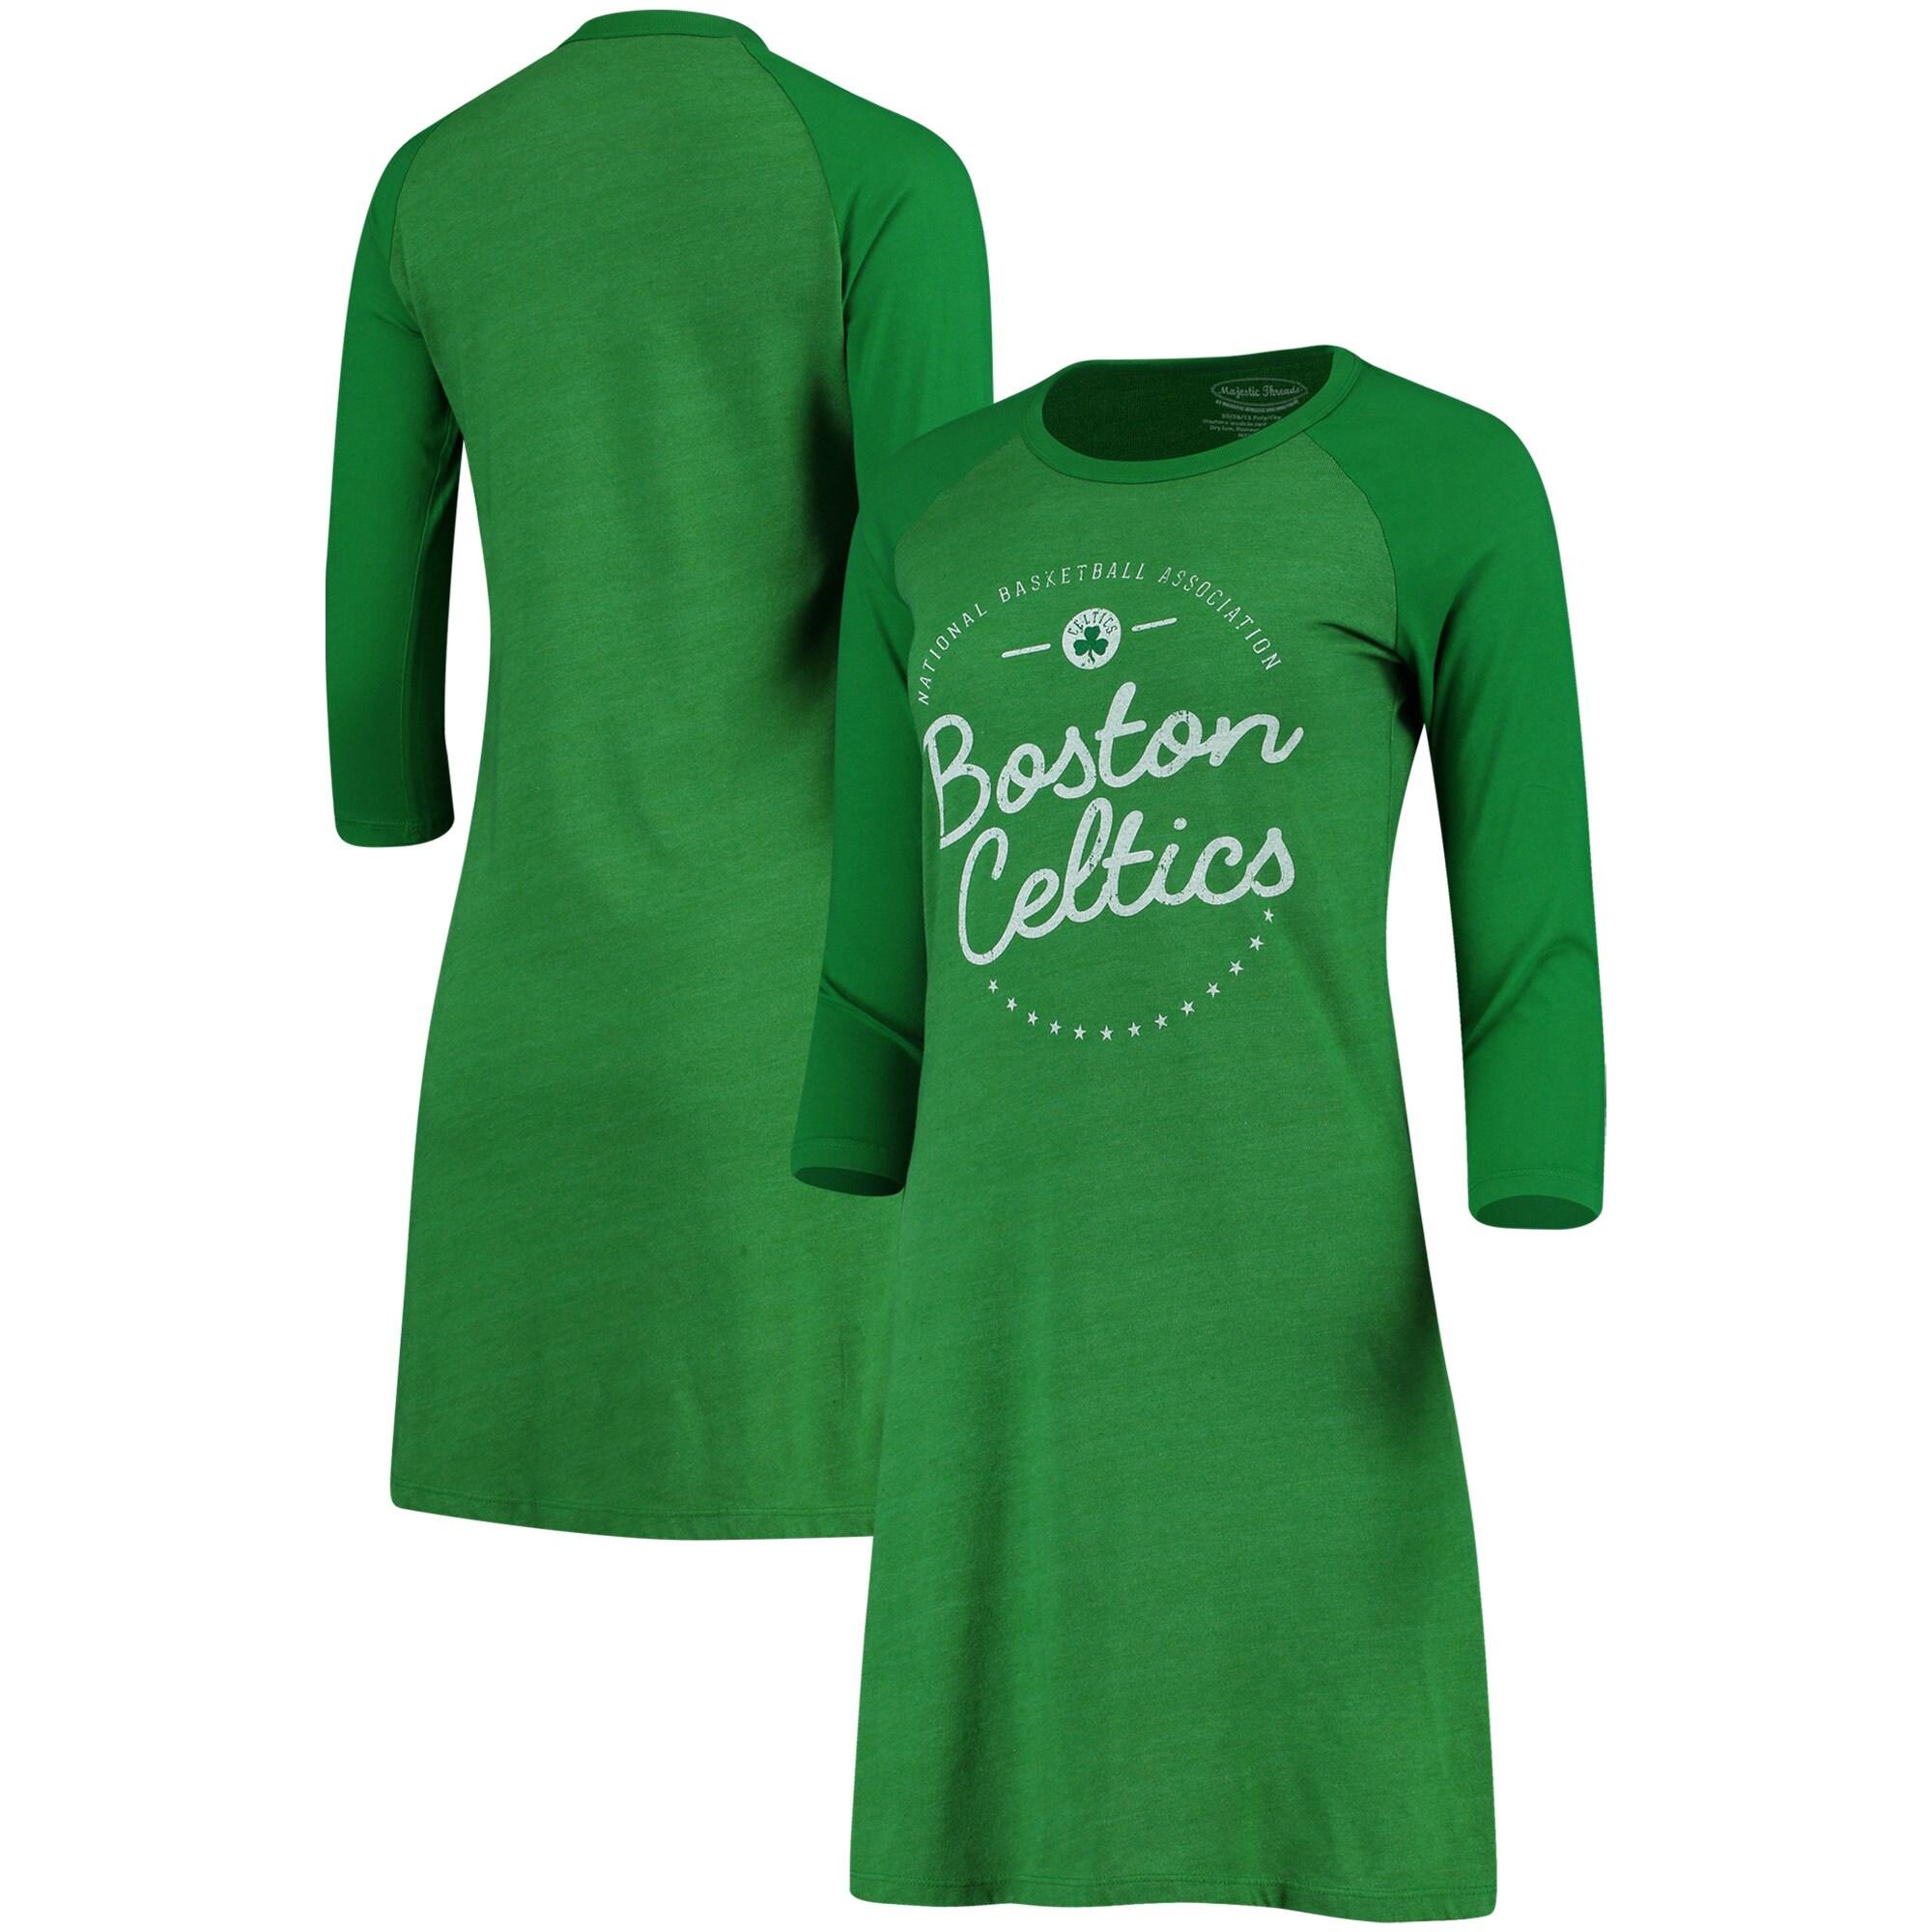 Boston Celtics Majestic Threads Women's Tri-Blend 3/4-Sleeve Raglan Dress - Kelly Green